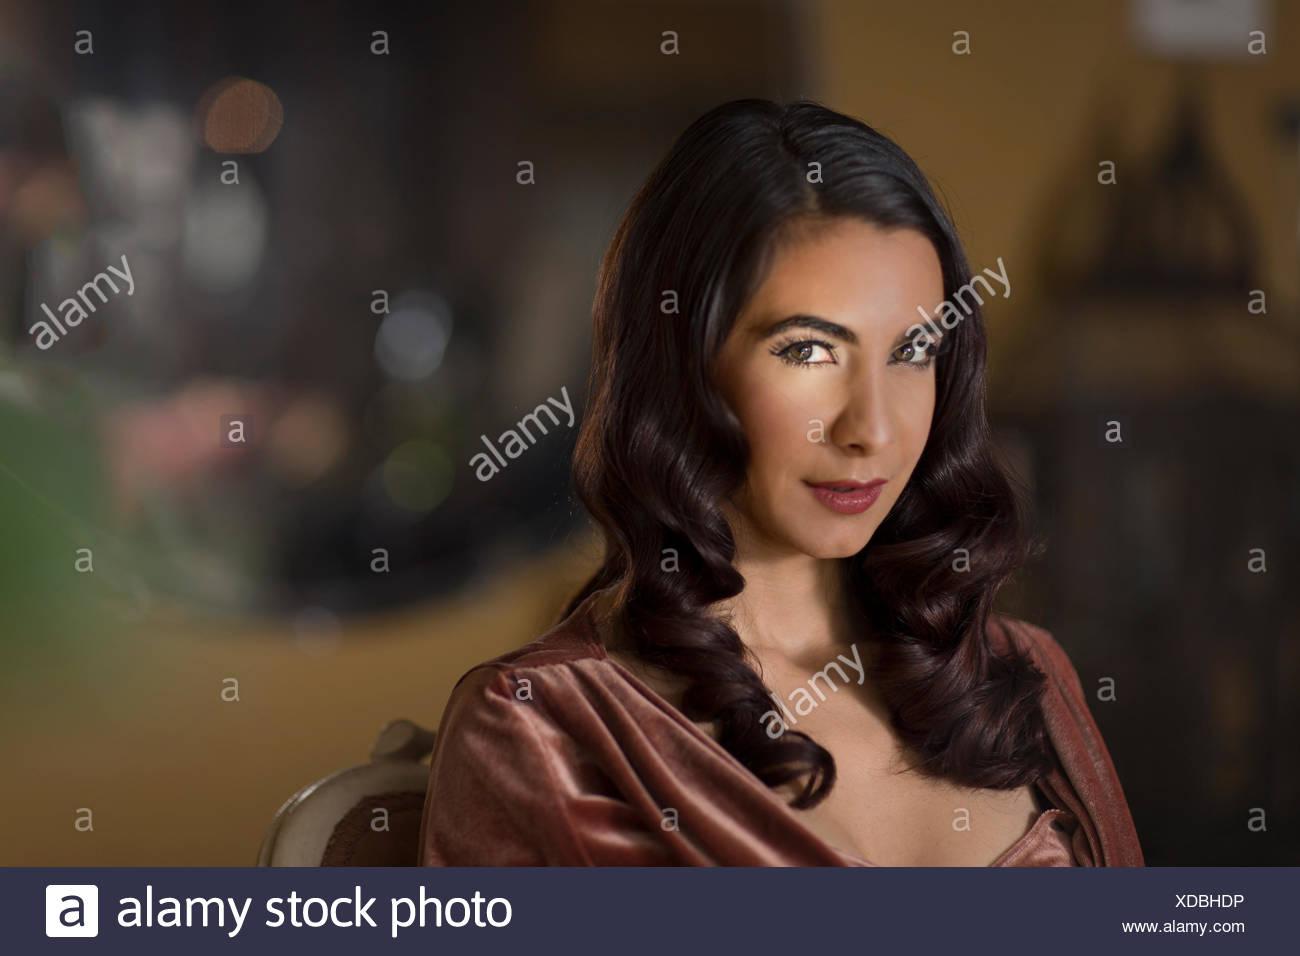 Porträt der Frau in den 1950er Jahren Stil Frisur Stockbild